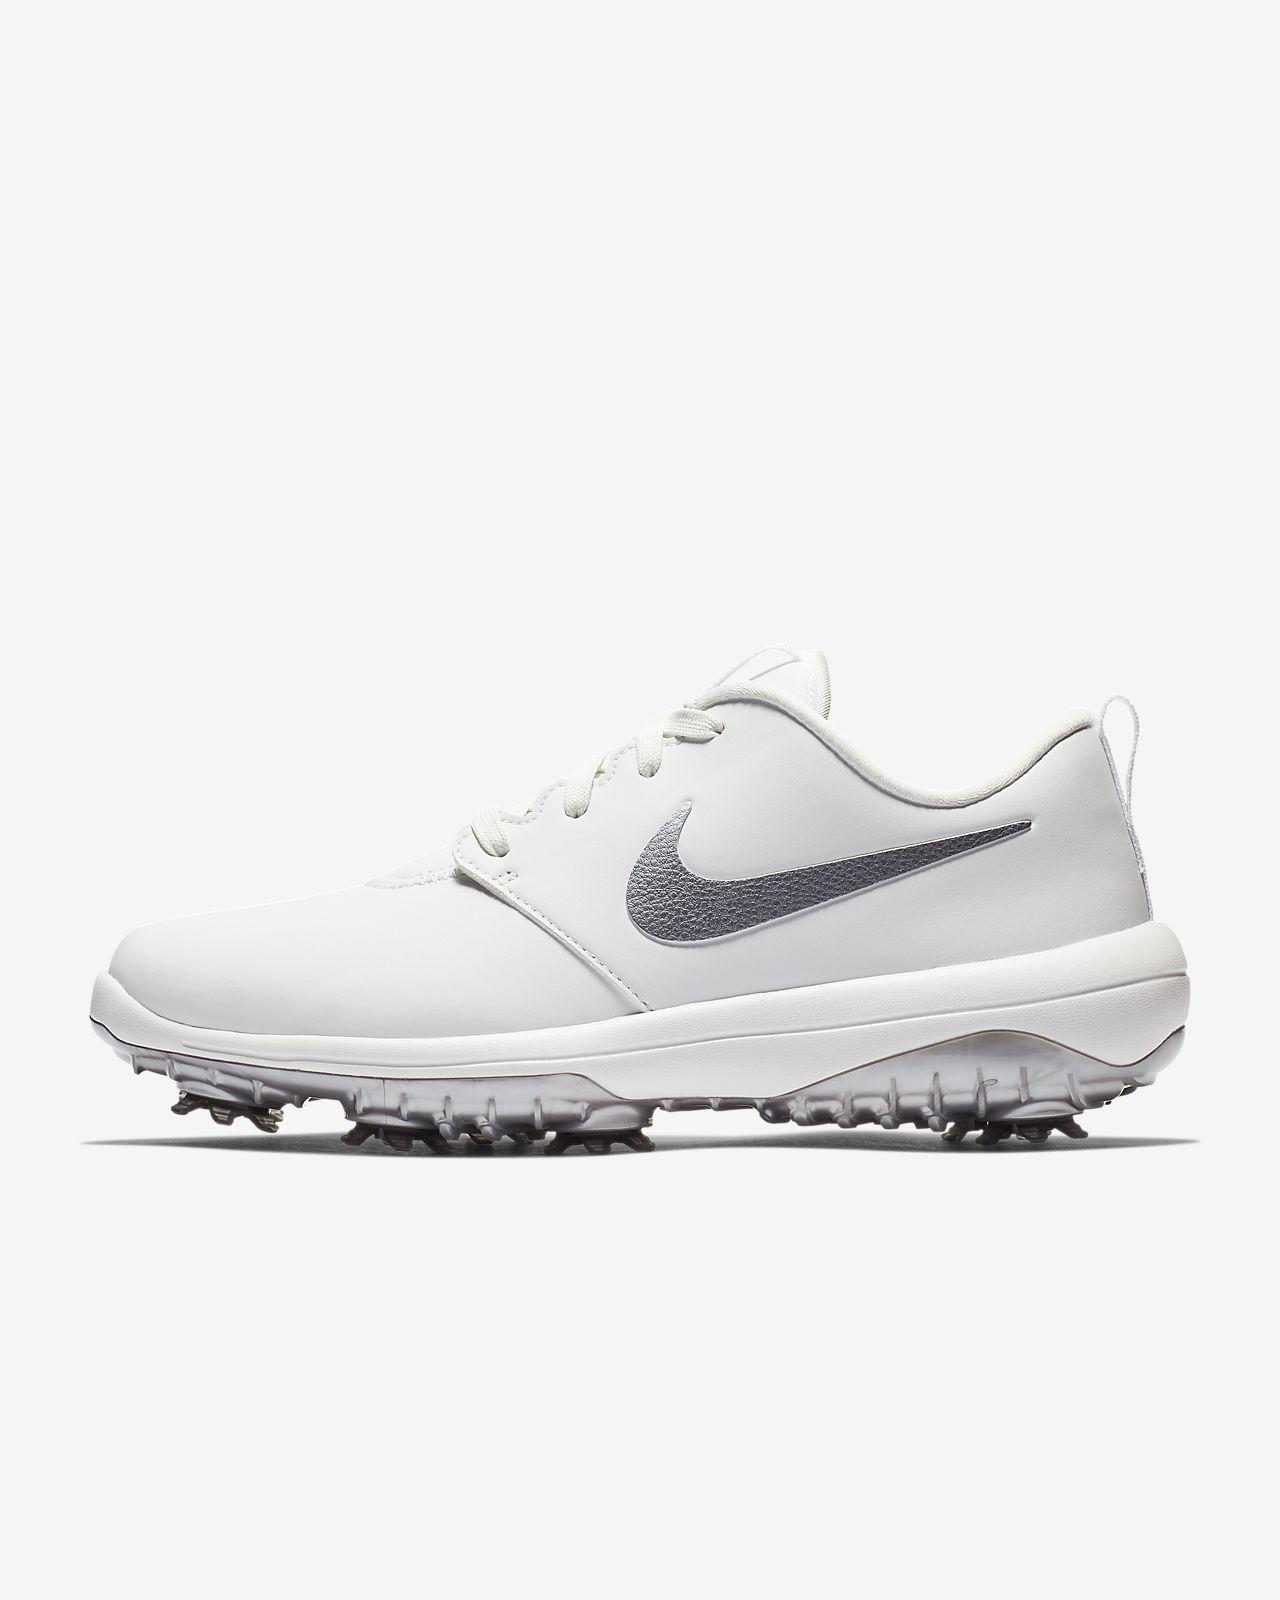 super popular 7bd18 4dd27 Chaussure Golf G Ca Roshe Tour Nike Pour Femme De ZzFrqZ